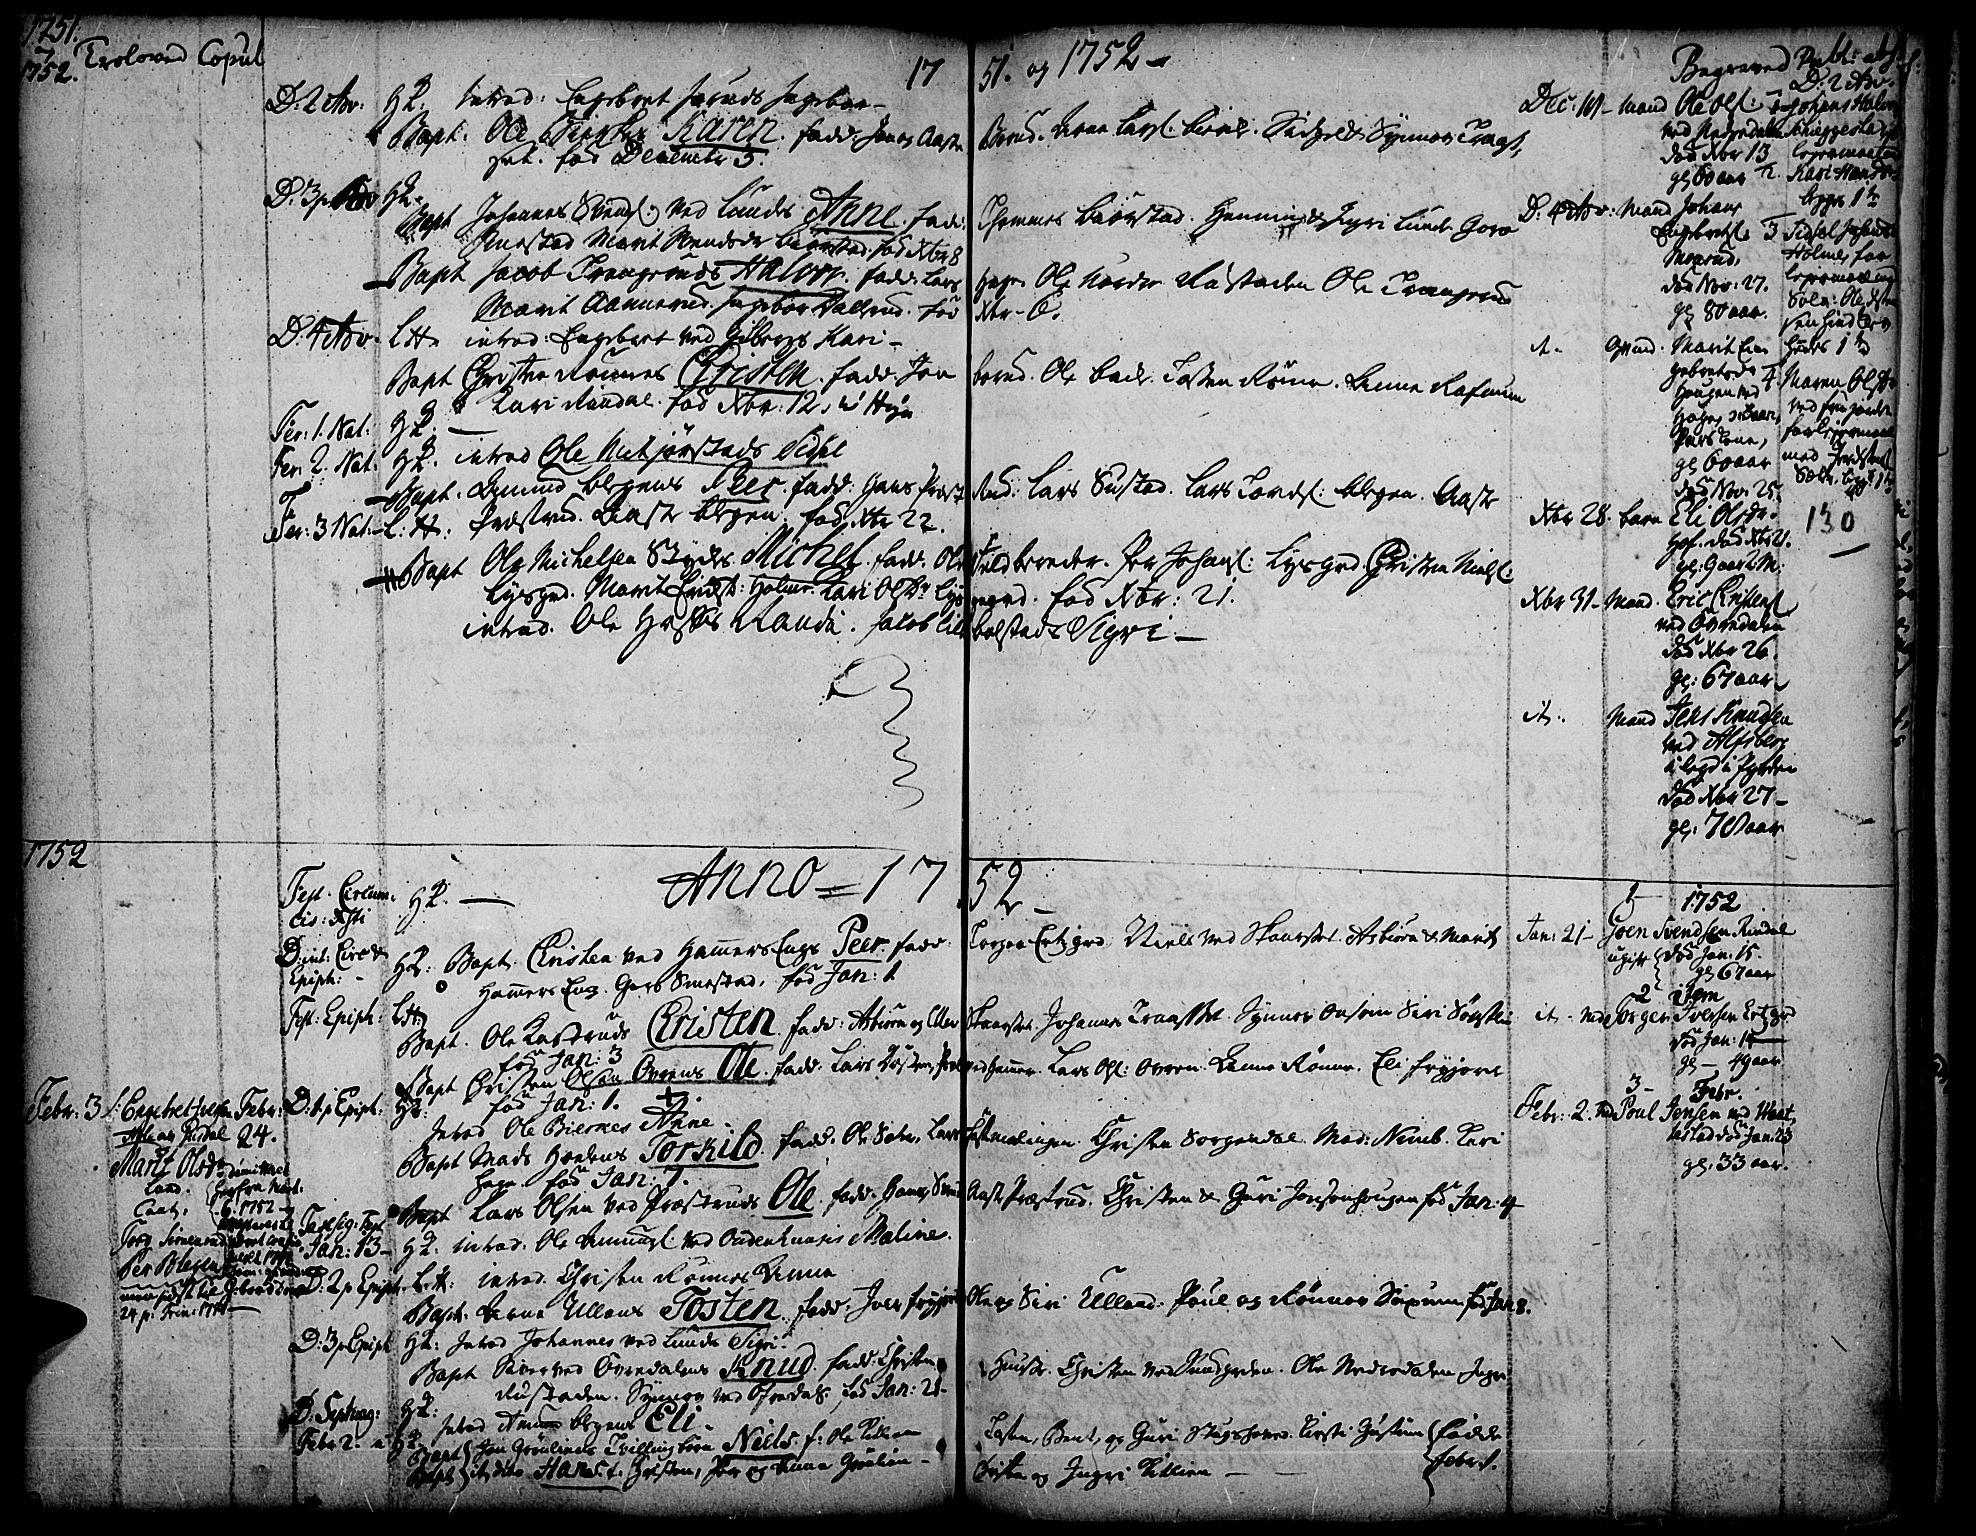 SAH, Fåberg prestekontor, Ministerialbok nr. 1, 1727-1775, s. 130